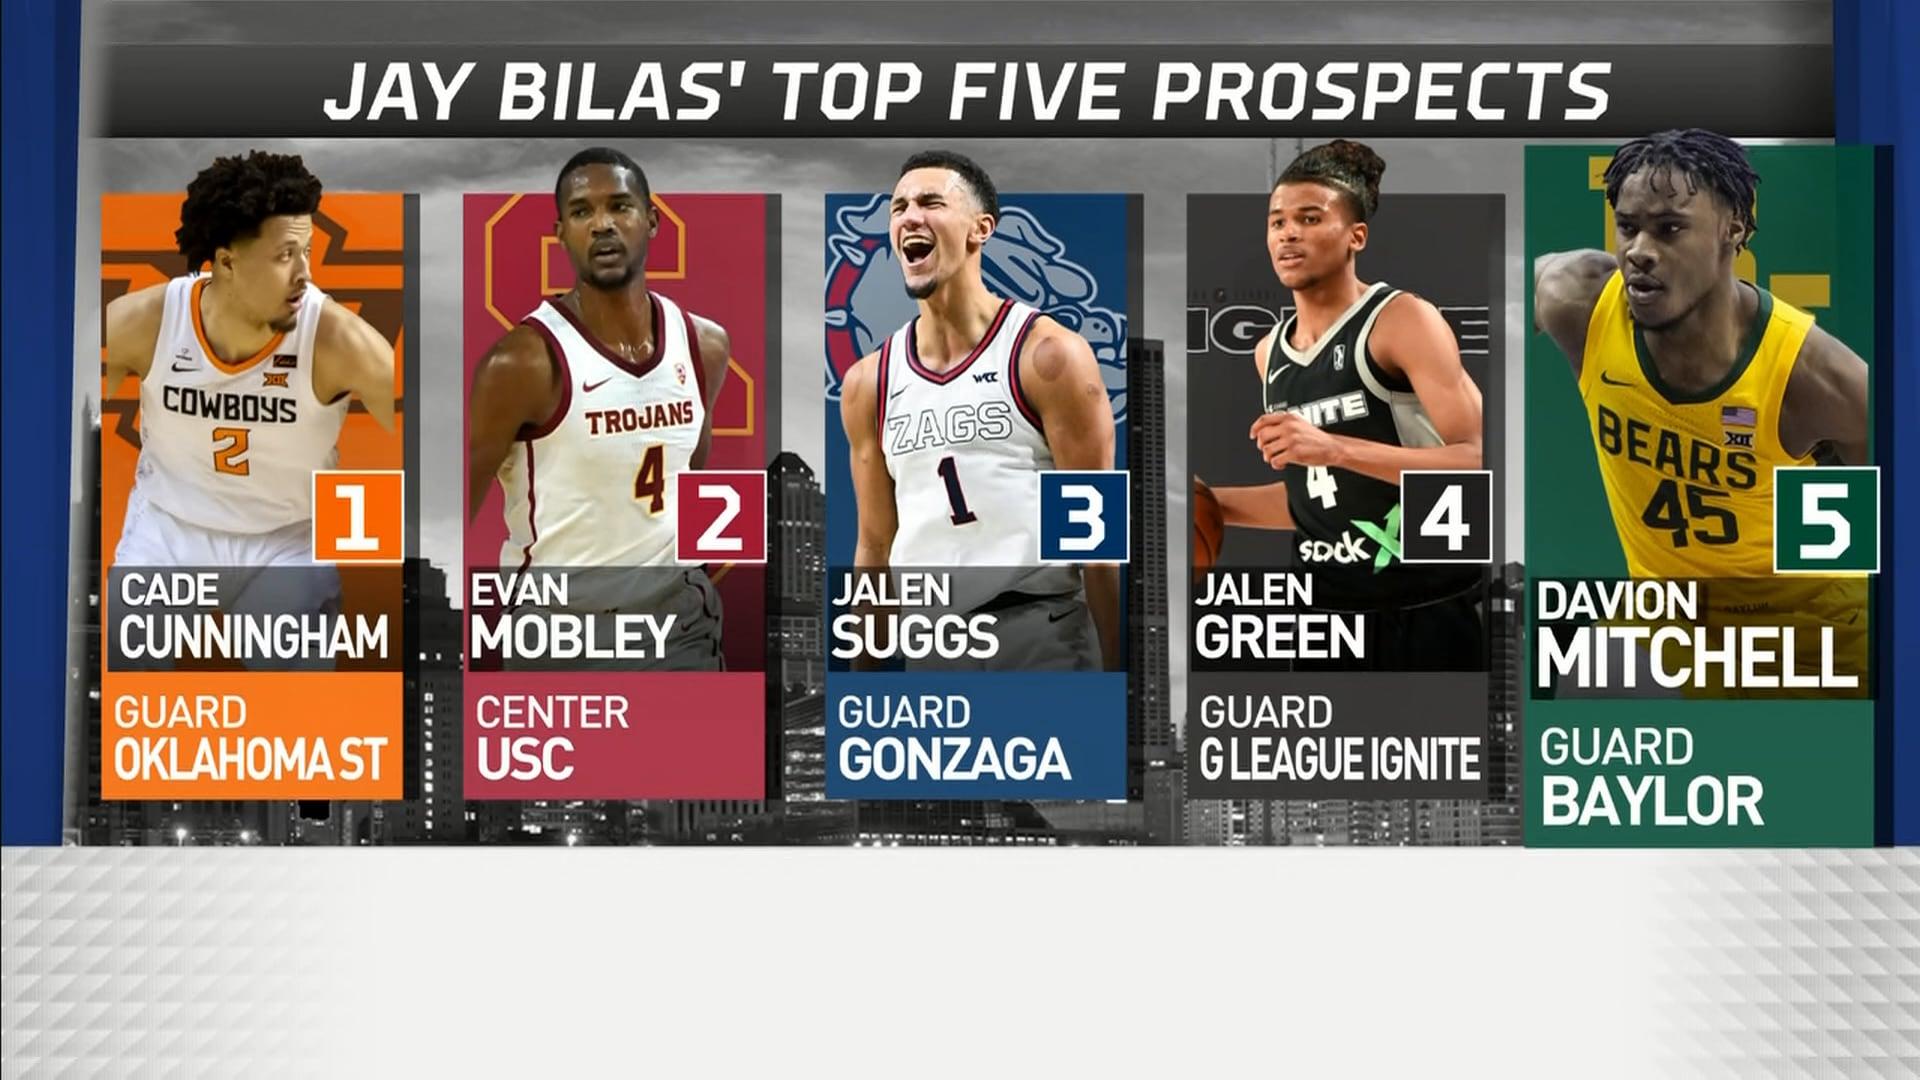 Jay Bilas' Top 5 prospects